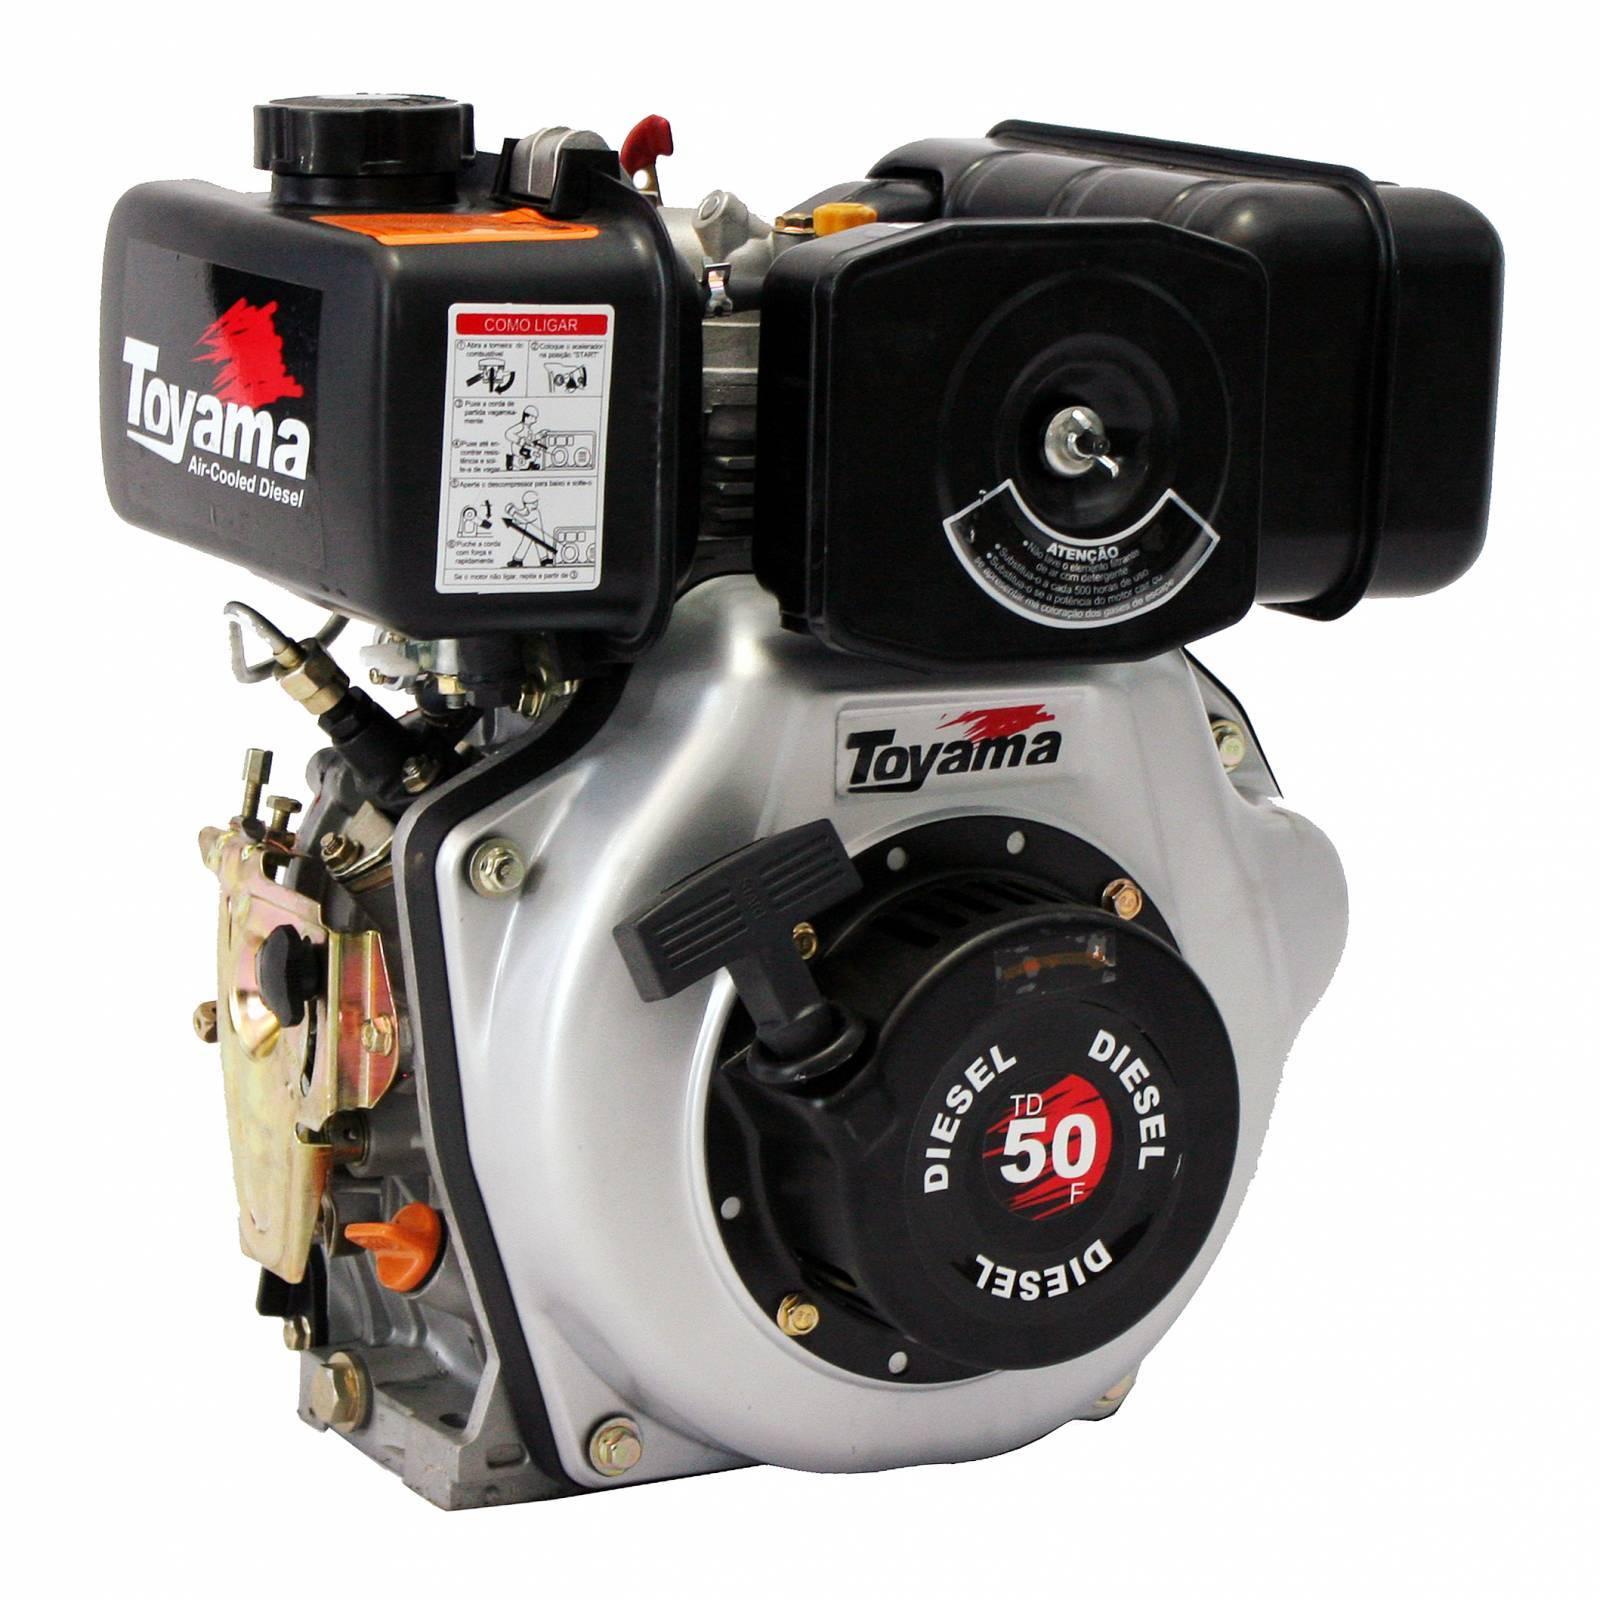 Motor Toyama TDE110 Diesel 418Cc 3600 RPM 10,5 HP, Em OFERTA - Hs Floresta e Jardim